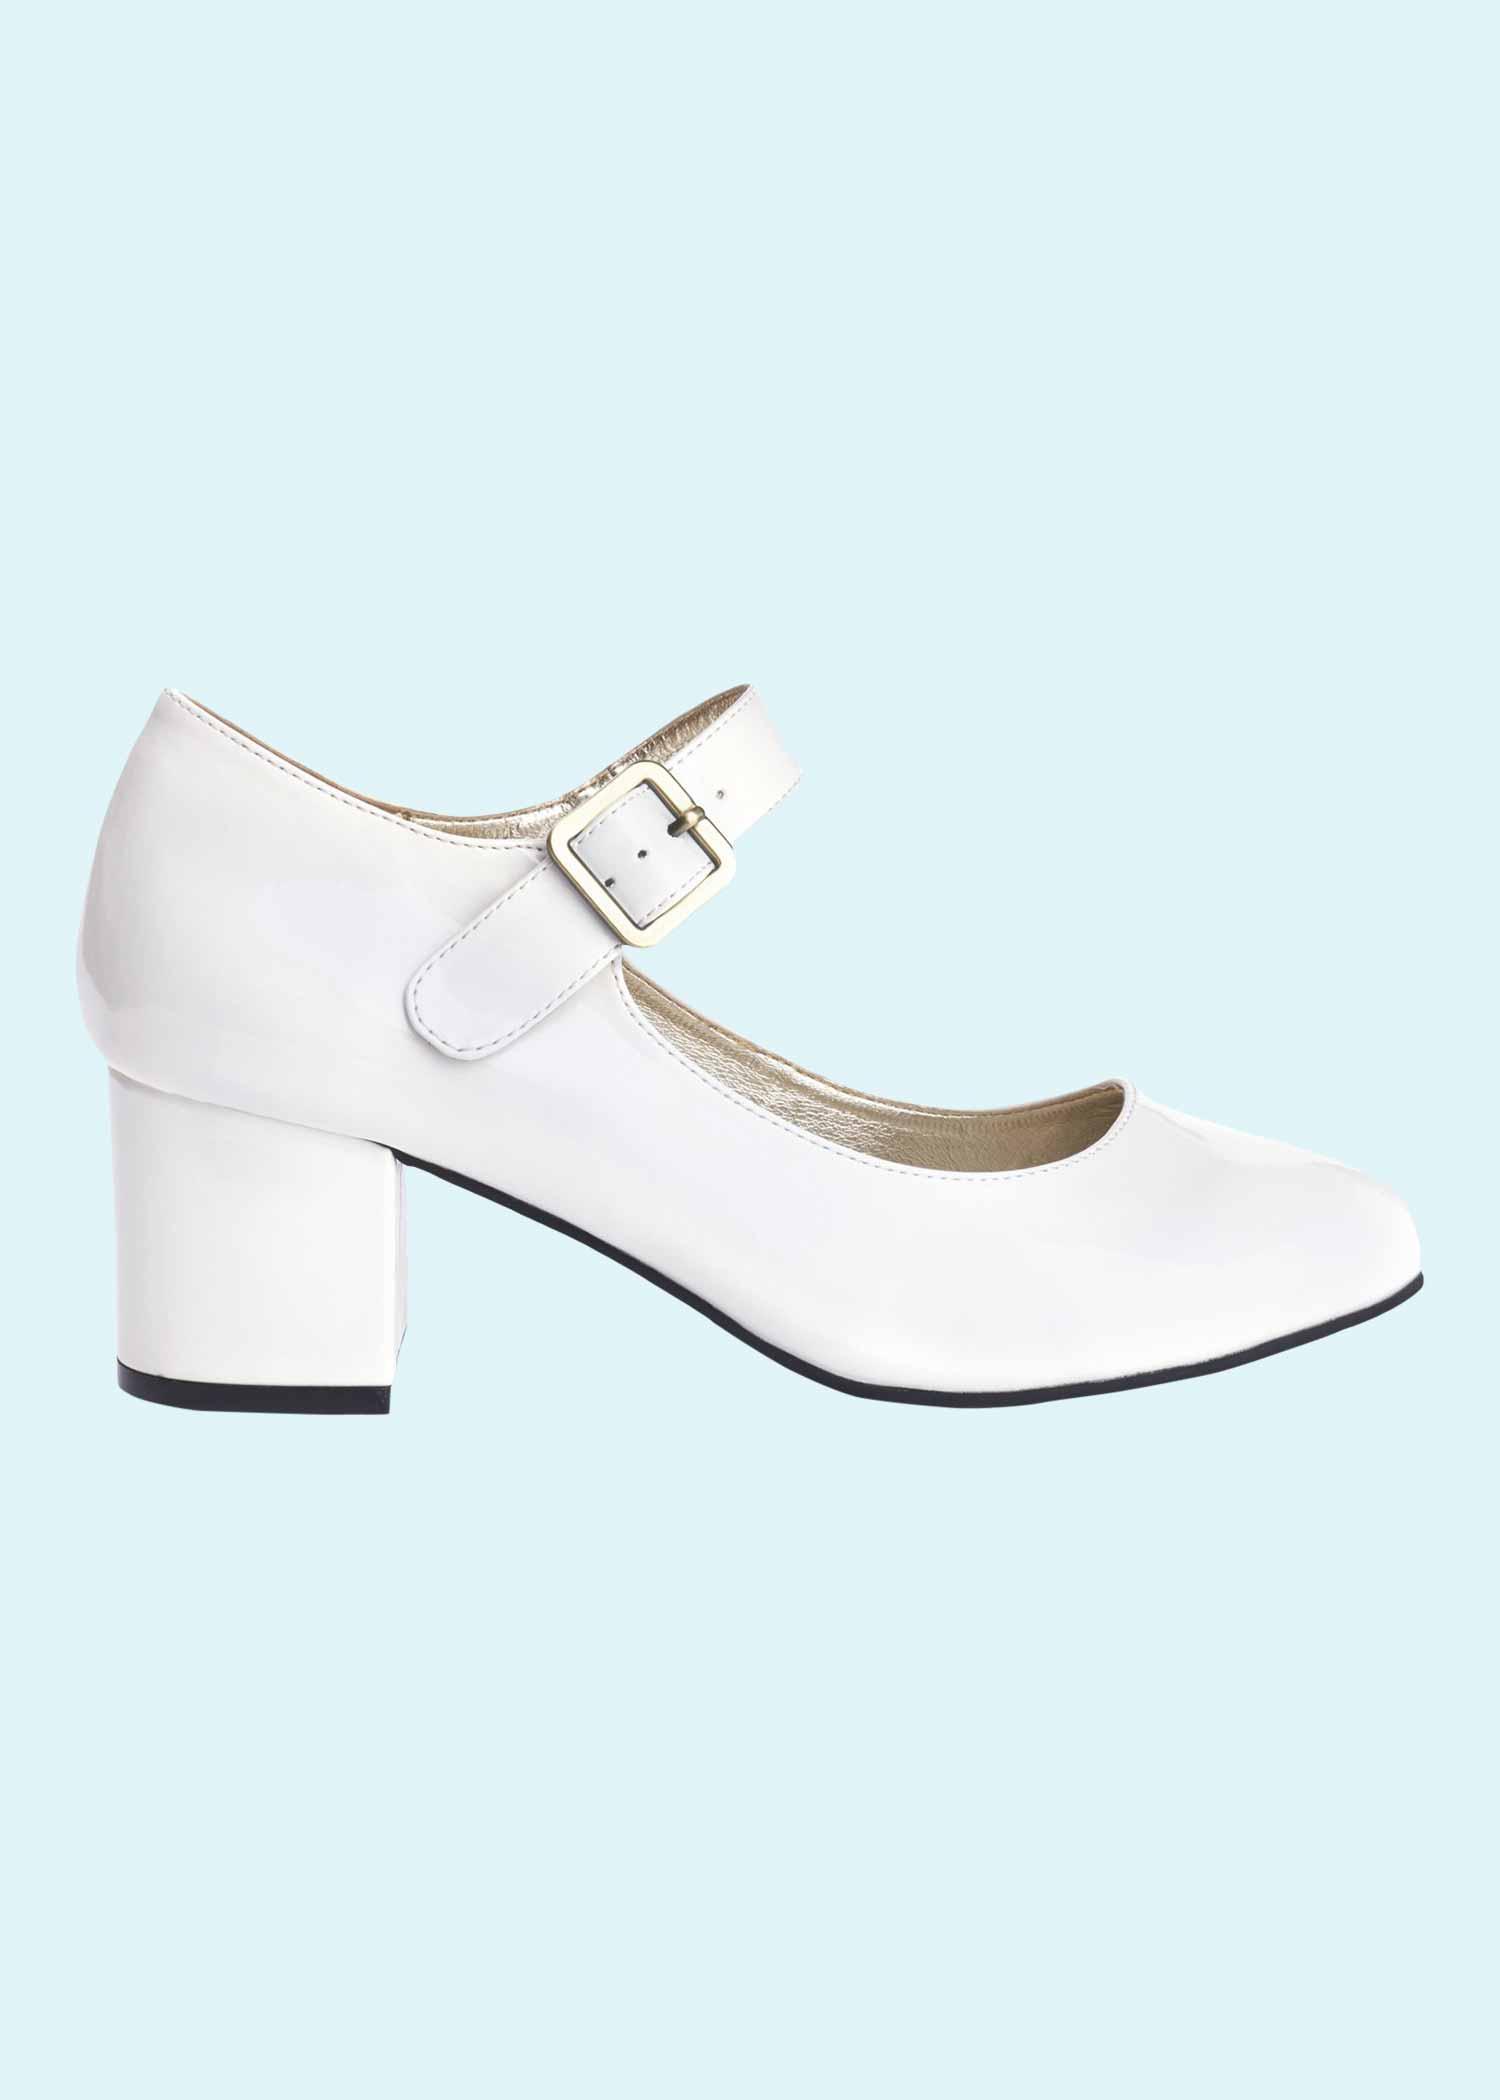 60'er Mary Jane sko i hvid lak fra Lola Ramona